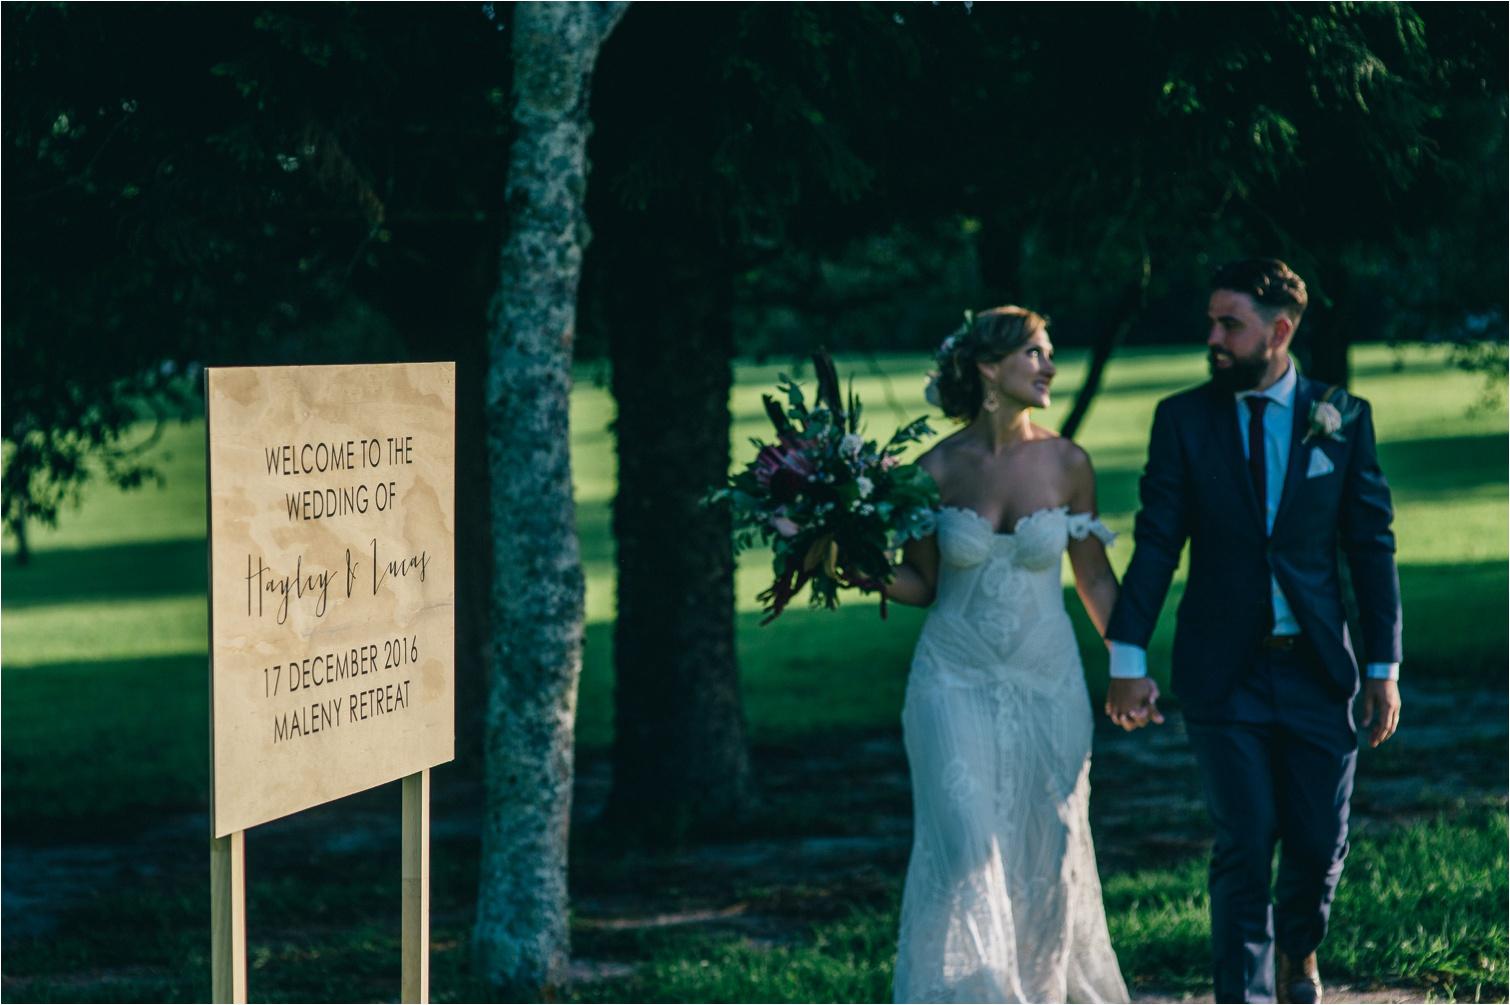 Maleny-Retreat-Wedding_Hayley&Lucas_by-The-Follans_0069.jpg